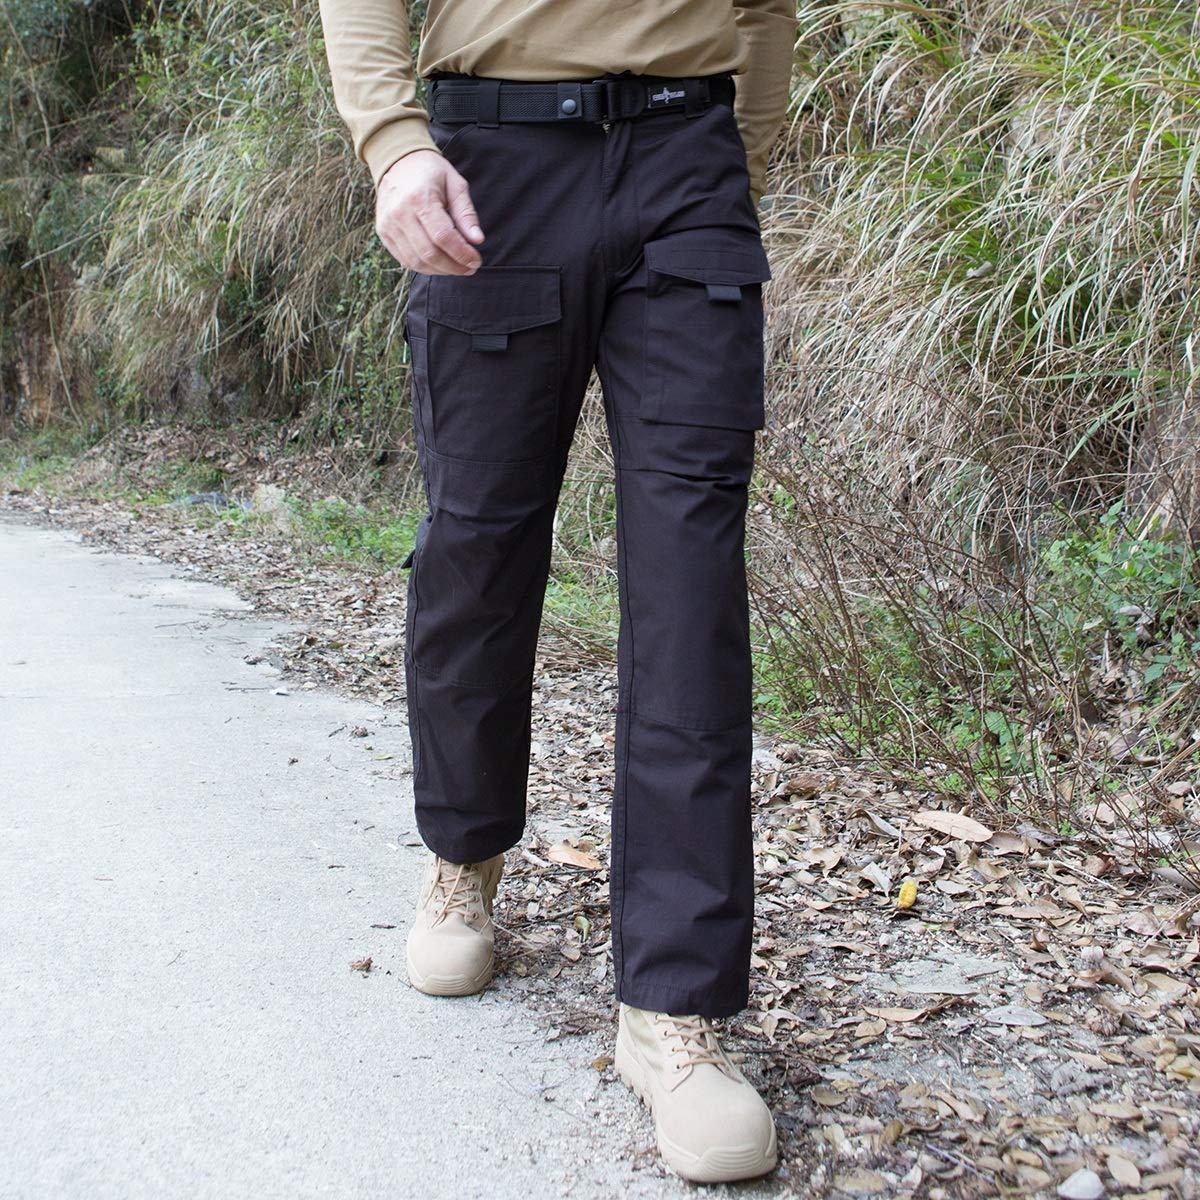 FREE SOLDIER Outdoor Men Teflon Scratch-Resistant Pants Four Seasons Hiking Climbing Tactical Trousers Black 38W x 32L